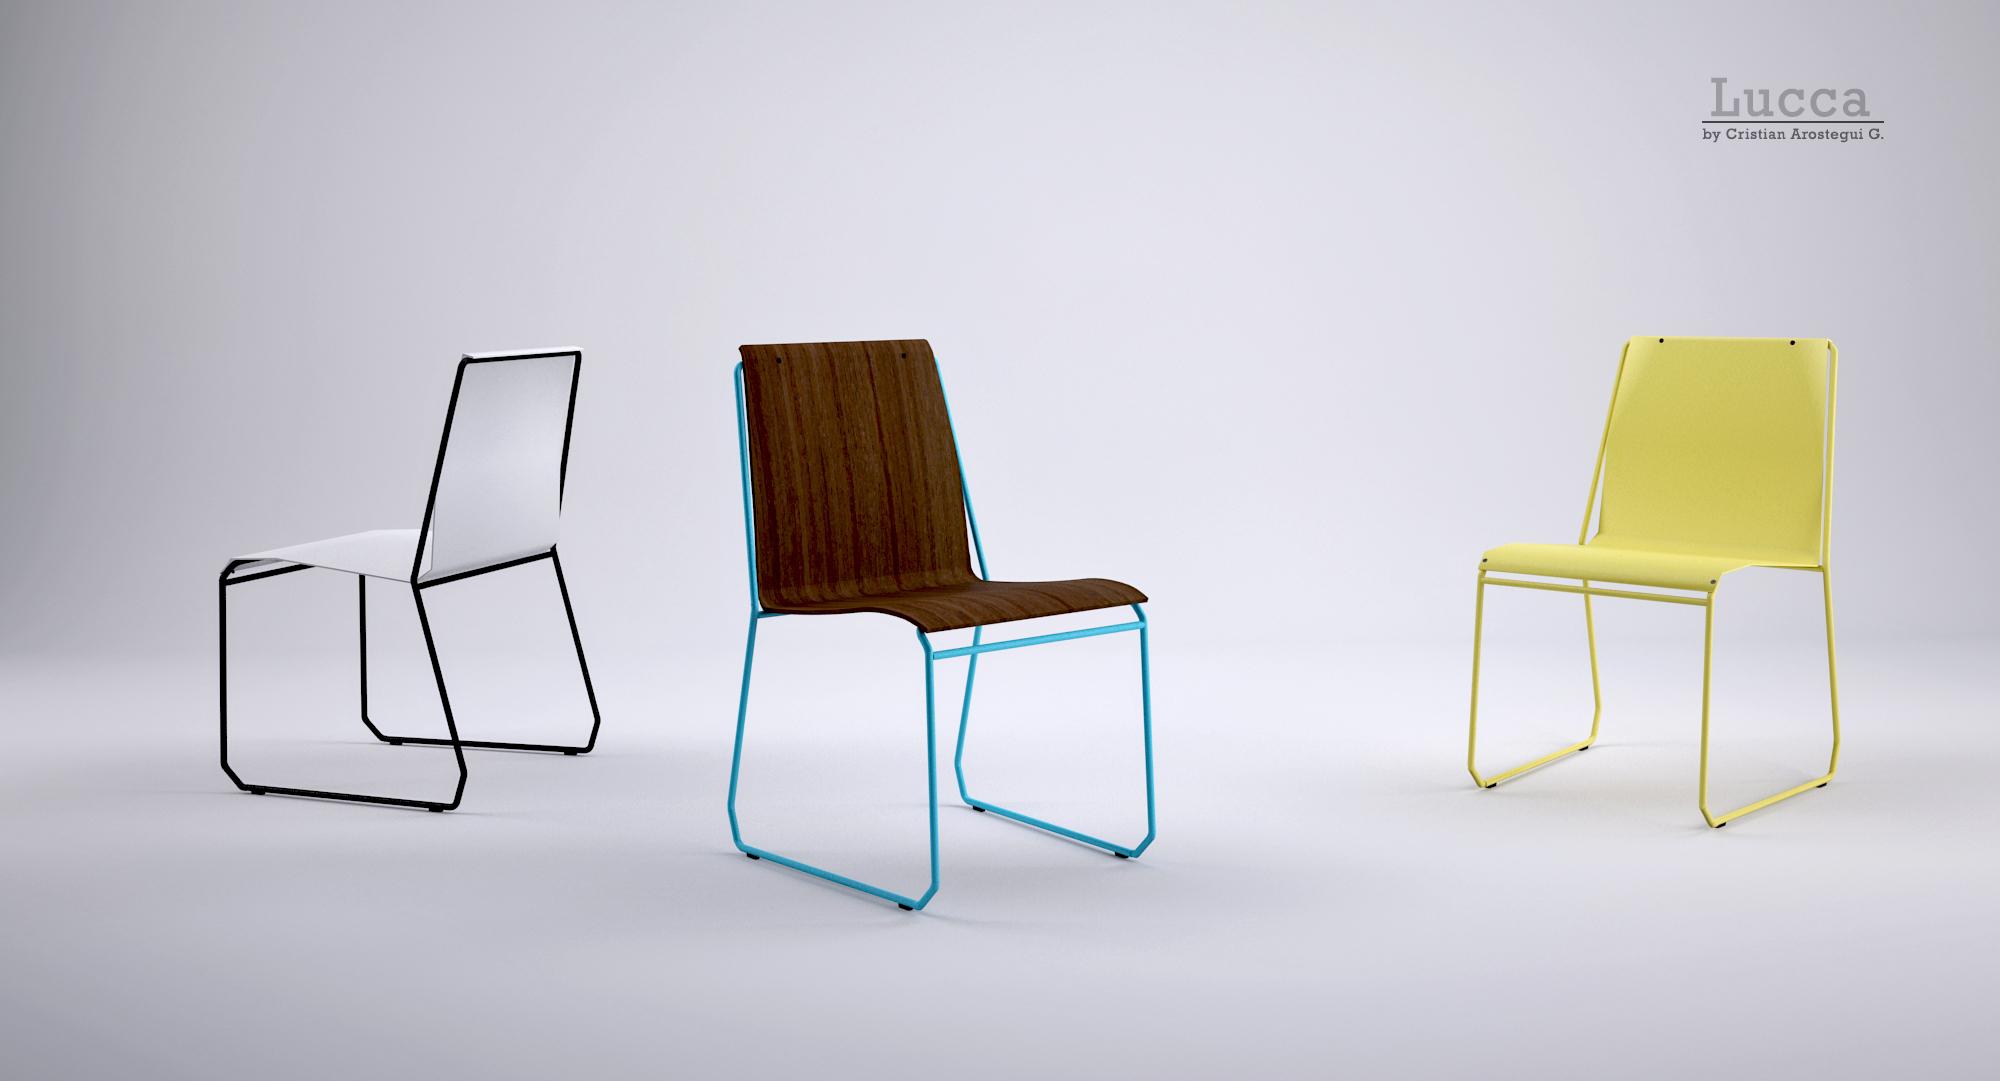 Lucca chair 2- cristian Arostegui- formabilio contest- Arostegui Studio.jpg